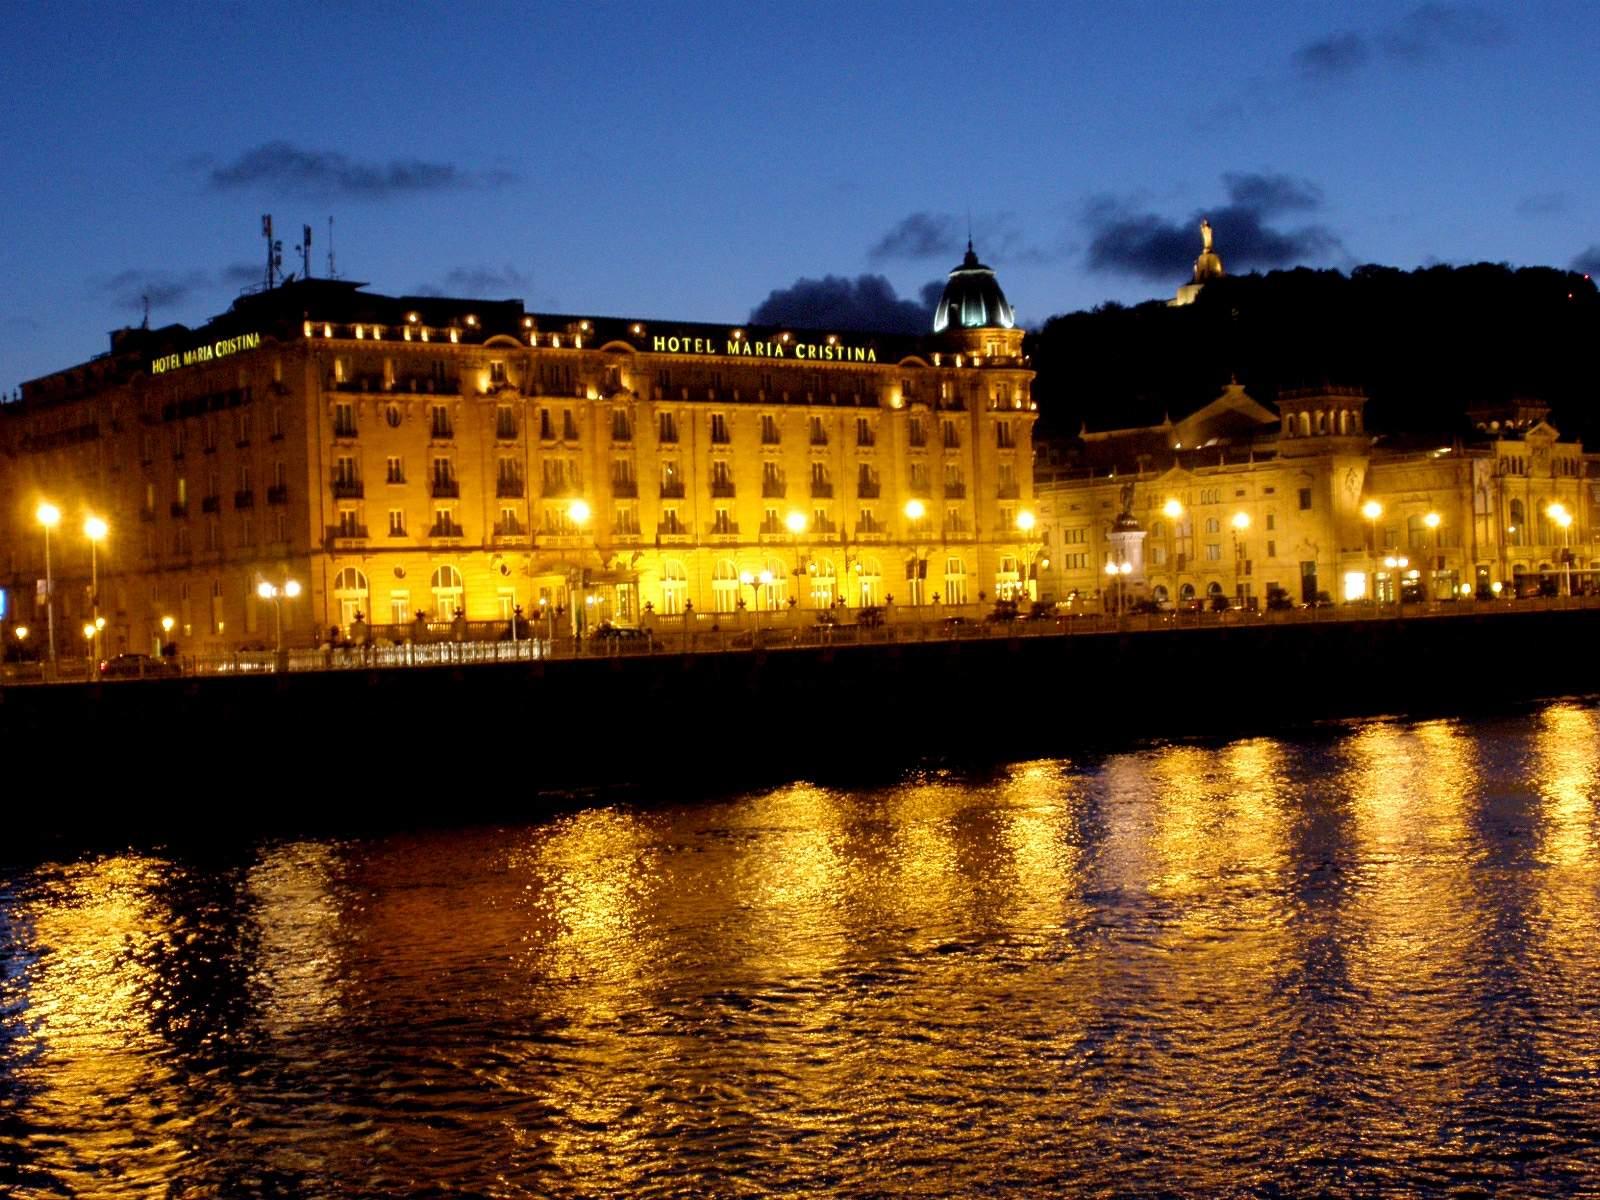 File:San Sebastian - Hotel Maria Cristina 3.JPG - Wikimedia Commons